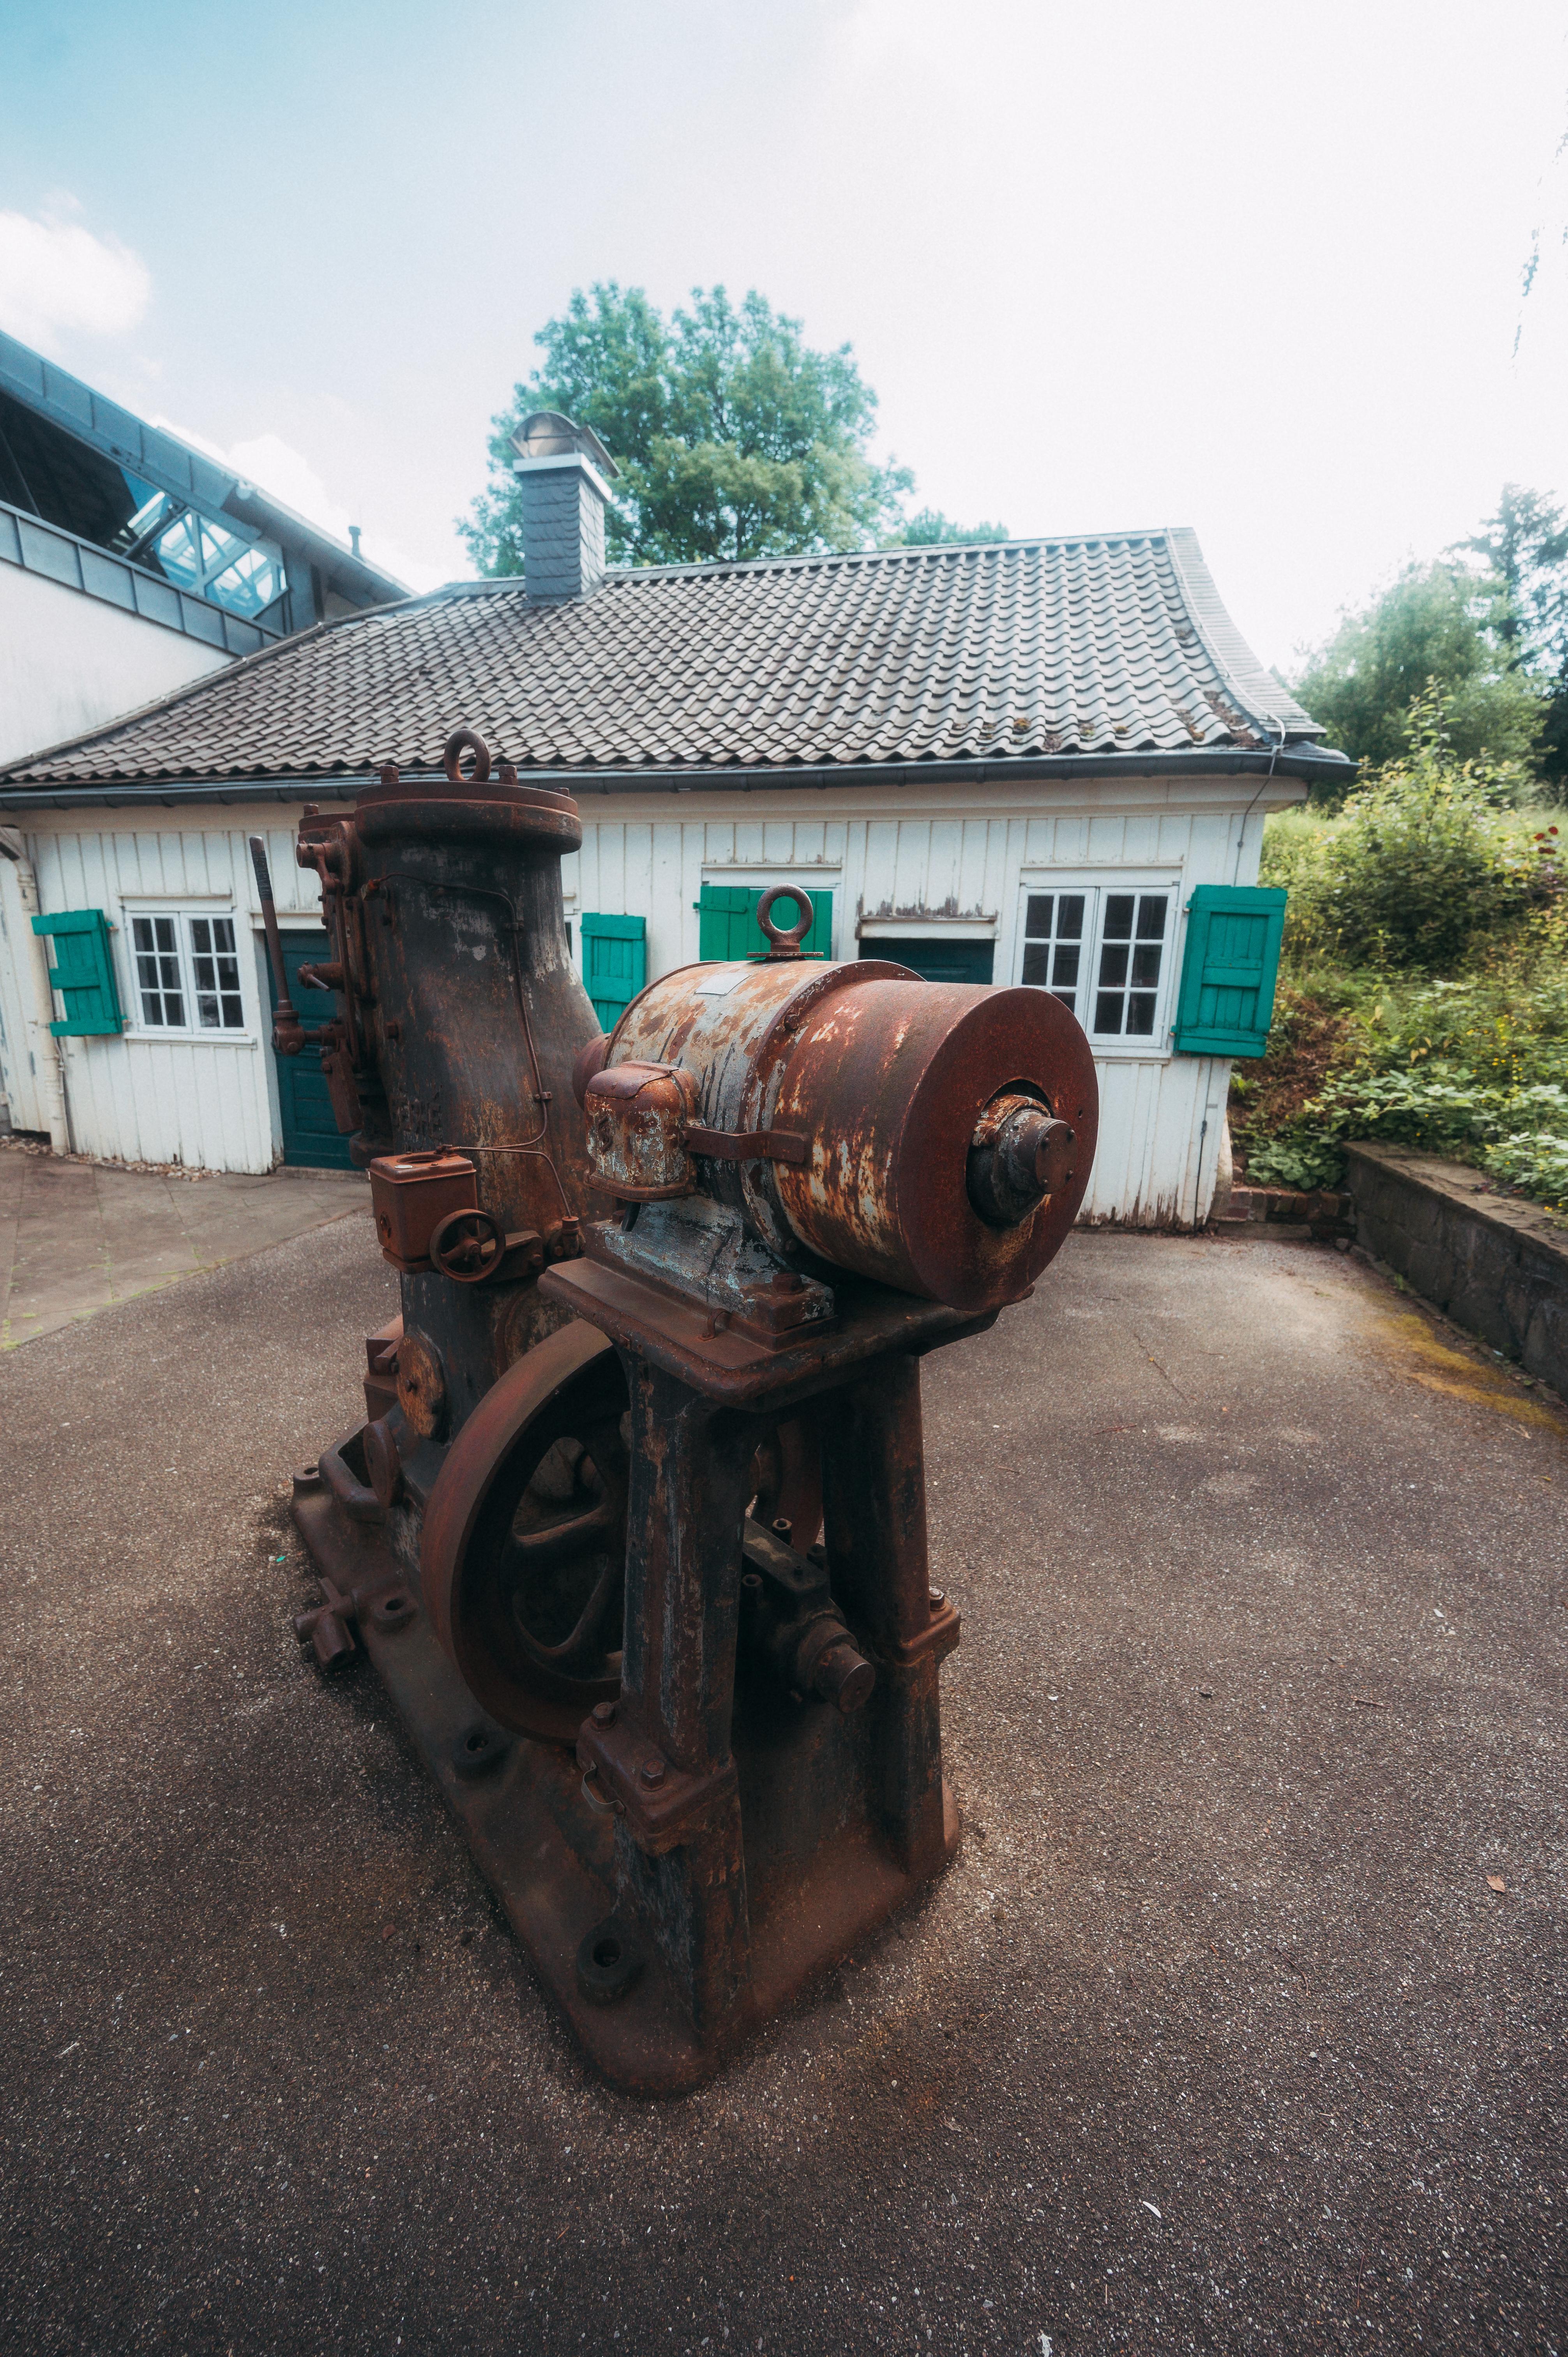 Hof des Werkzeugmuseums in Remscheid